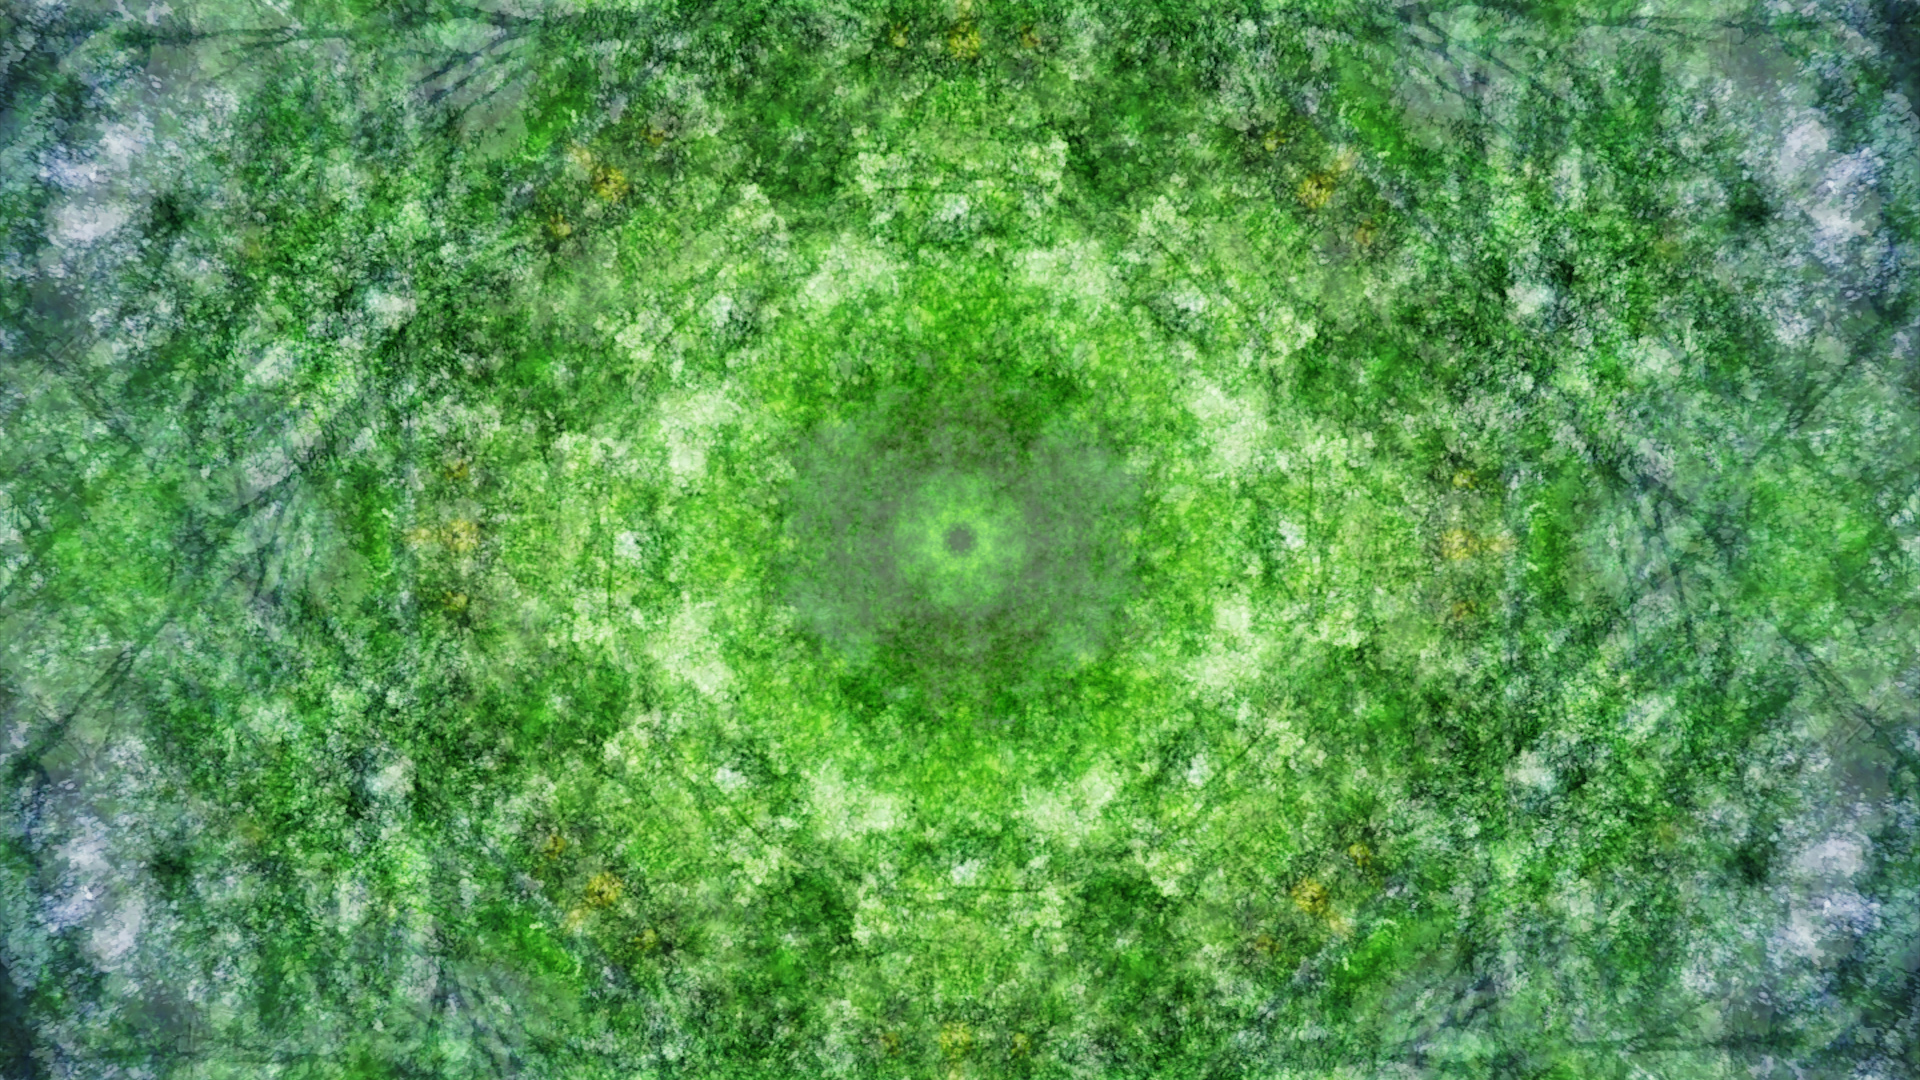 Emitting Velocity - Mohican Forest by Matt Swift Still 4